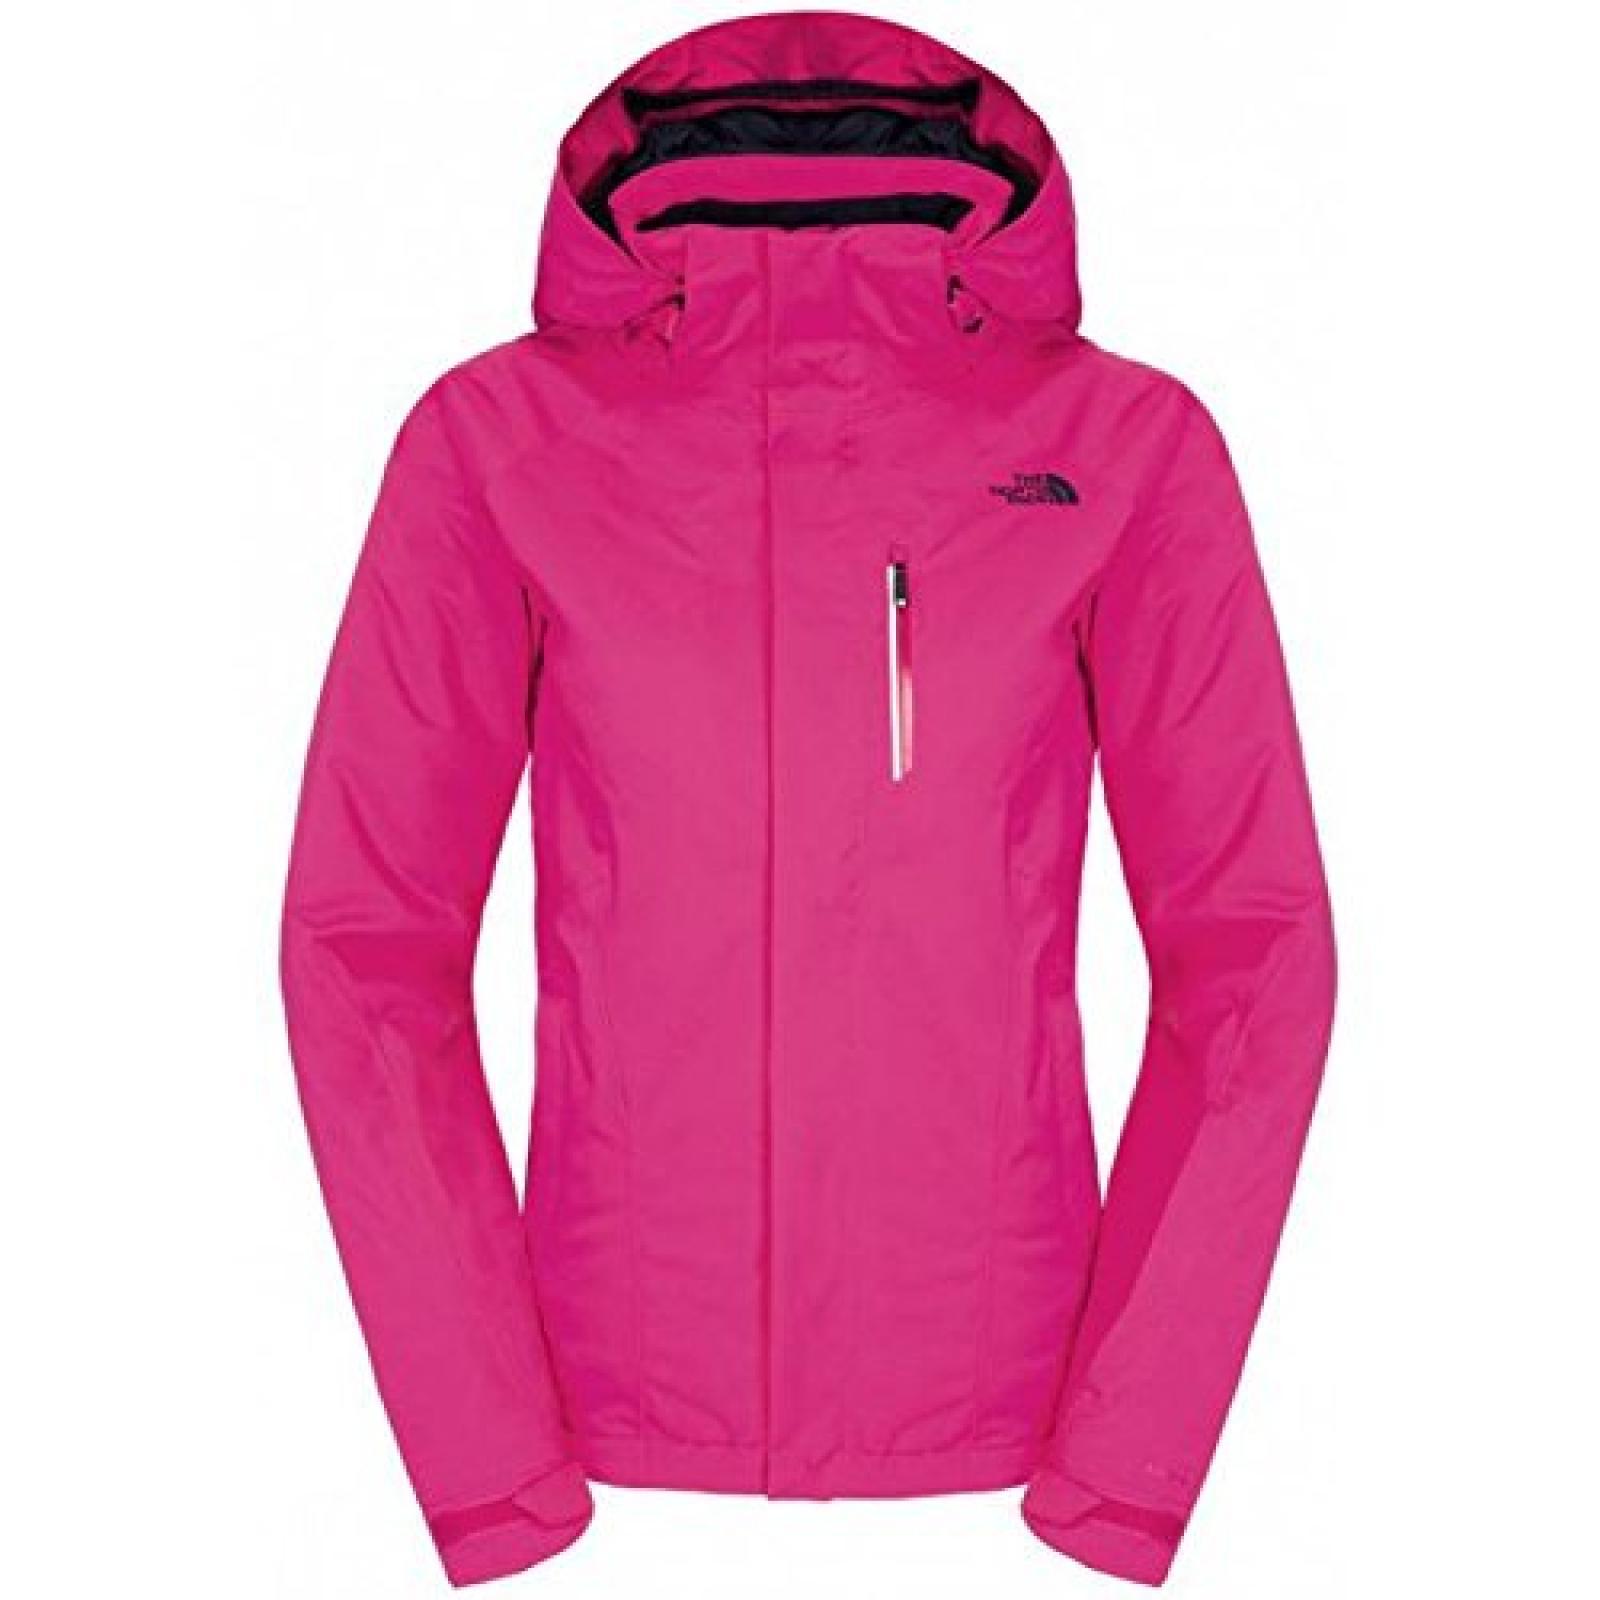 Damen Skijacke Jeppeson Jacket passion pink